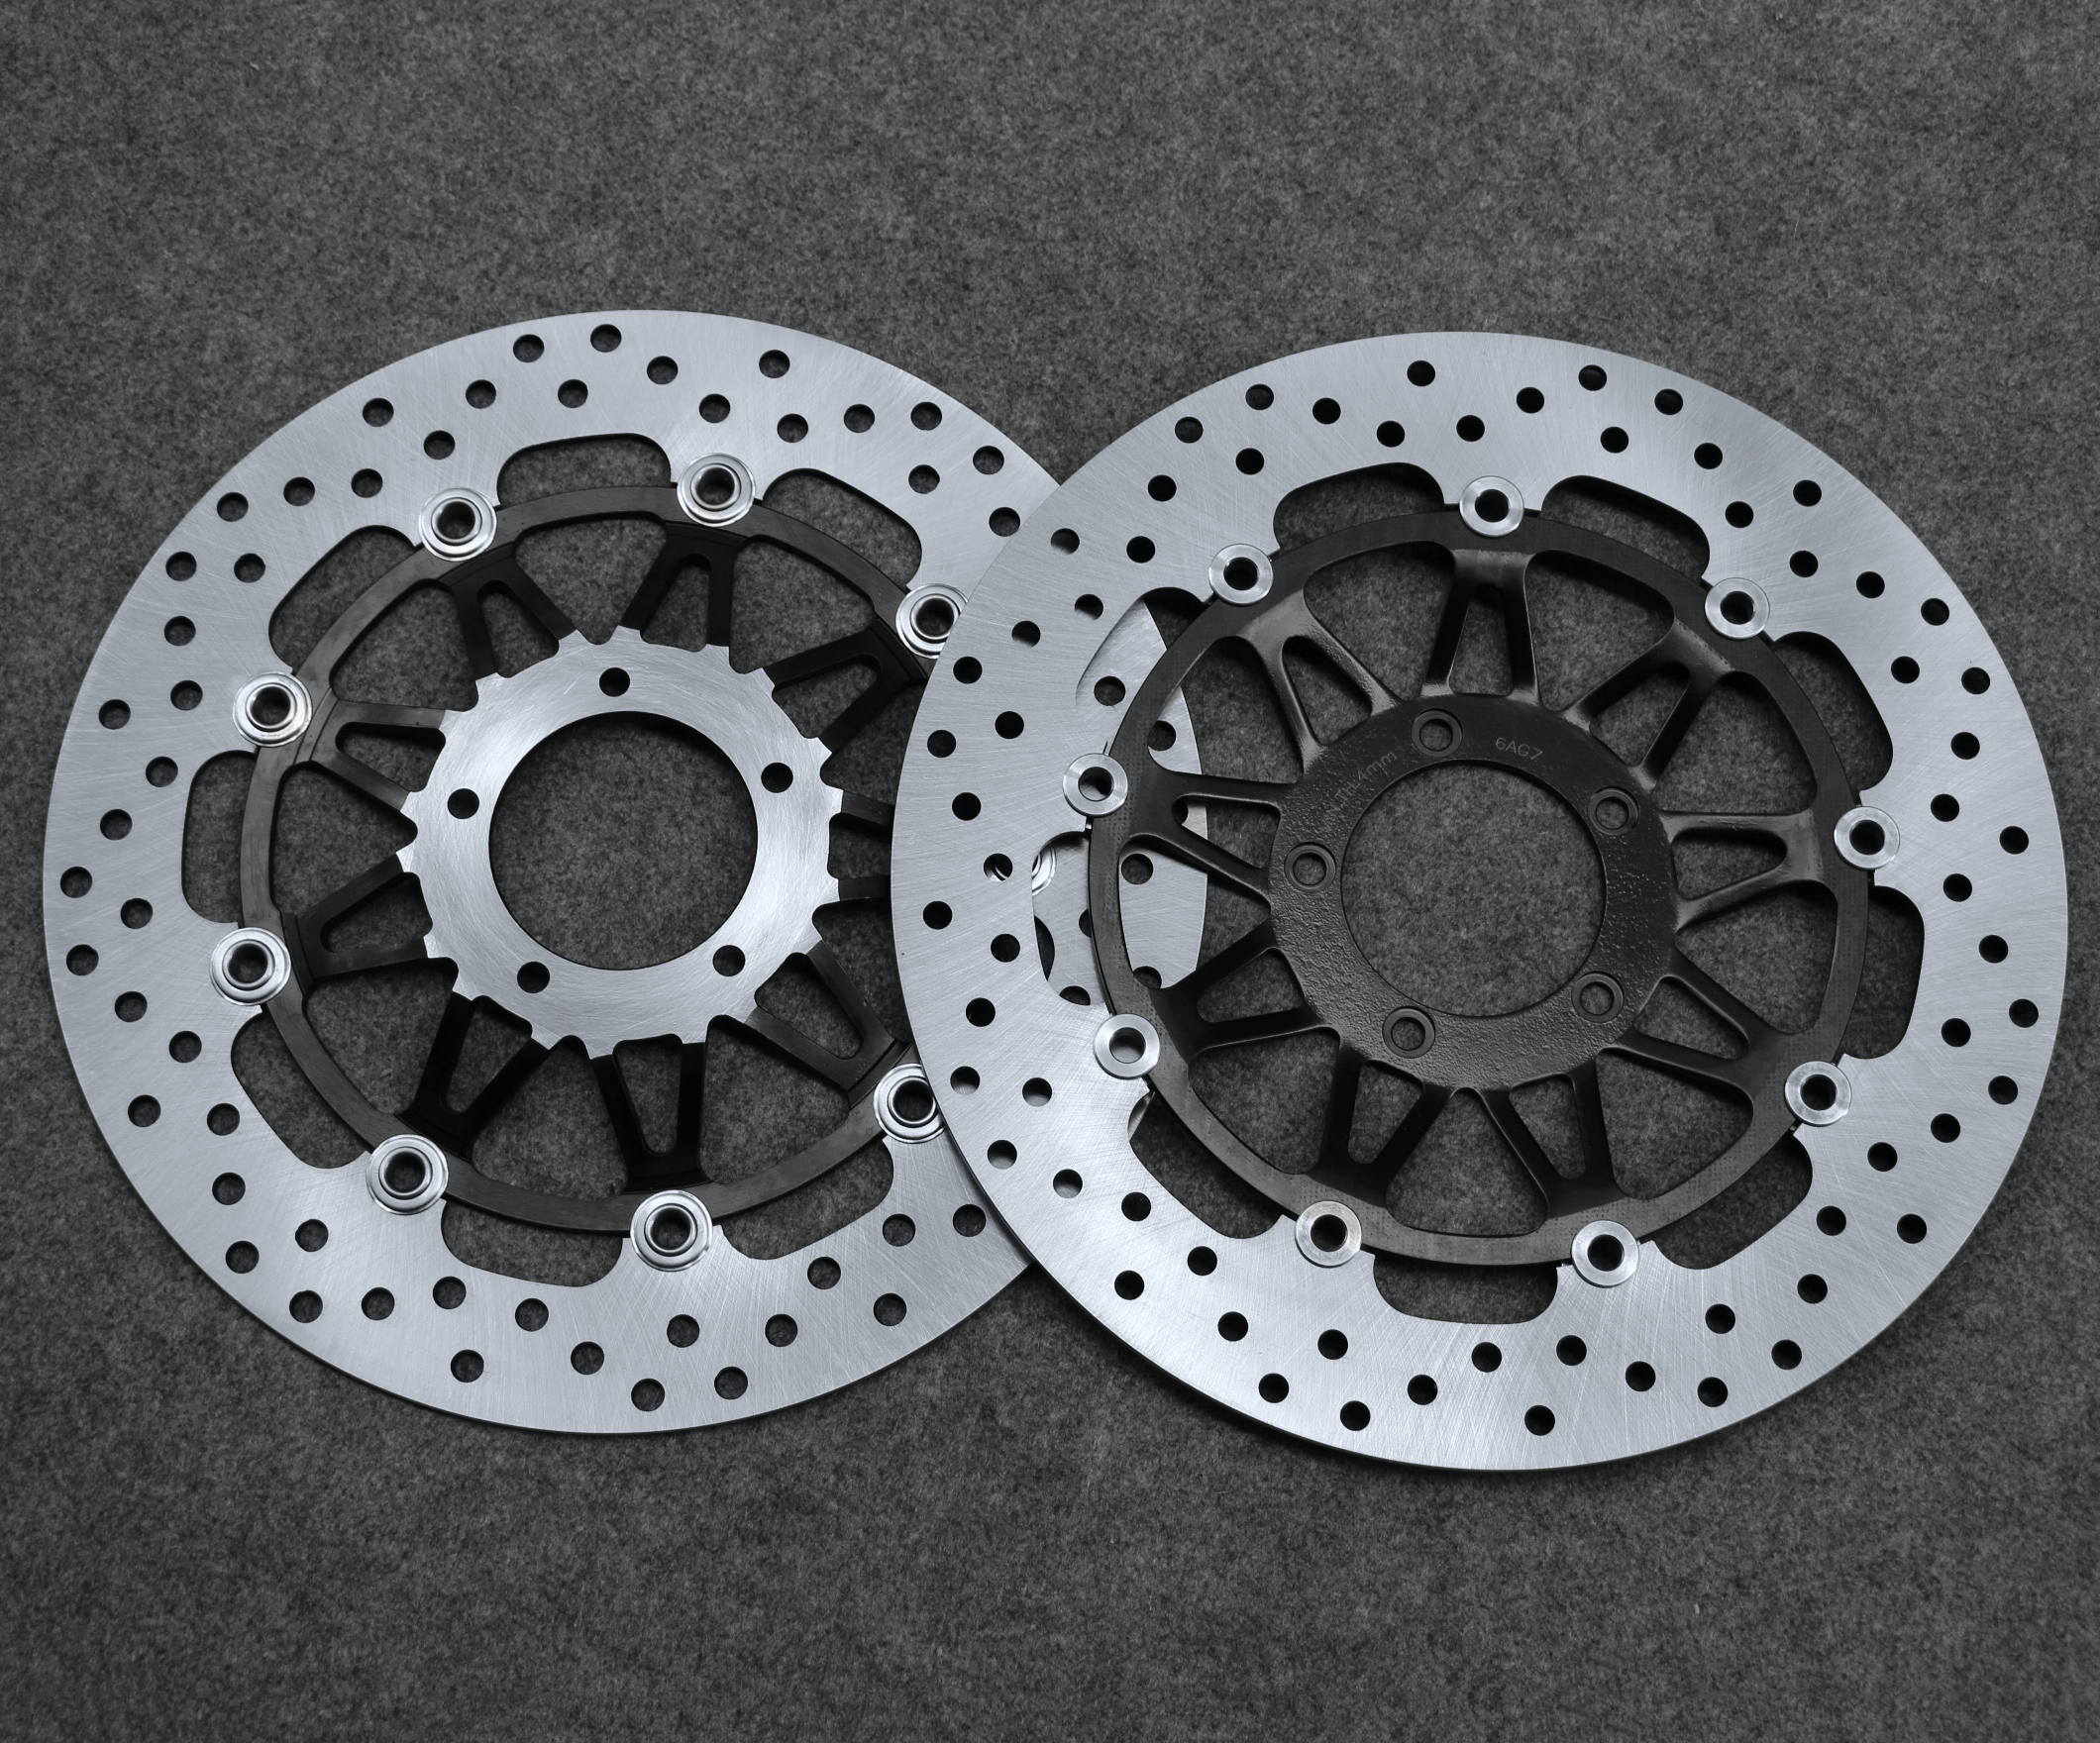 Black CNC Billet Frame Plugs Kit For Ducati 998 S R 2002-2004 02 03 04